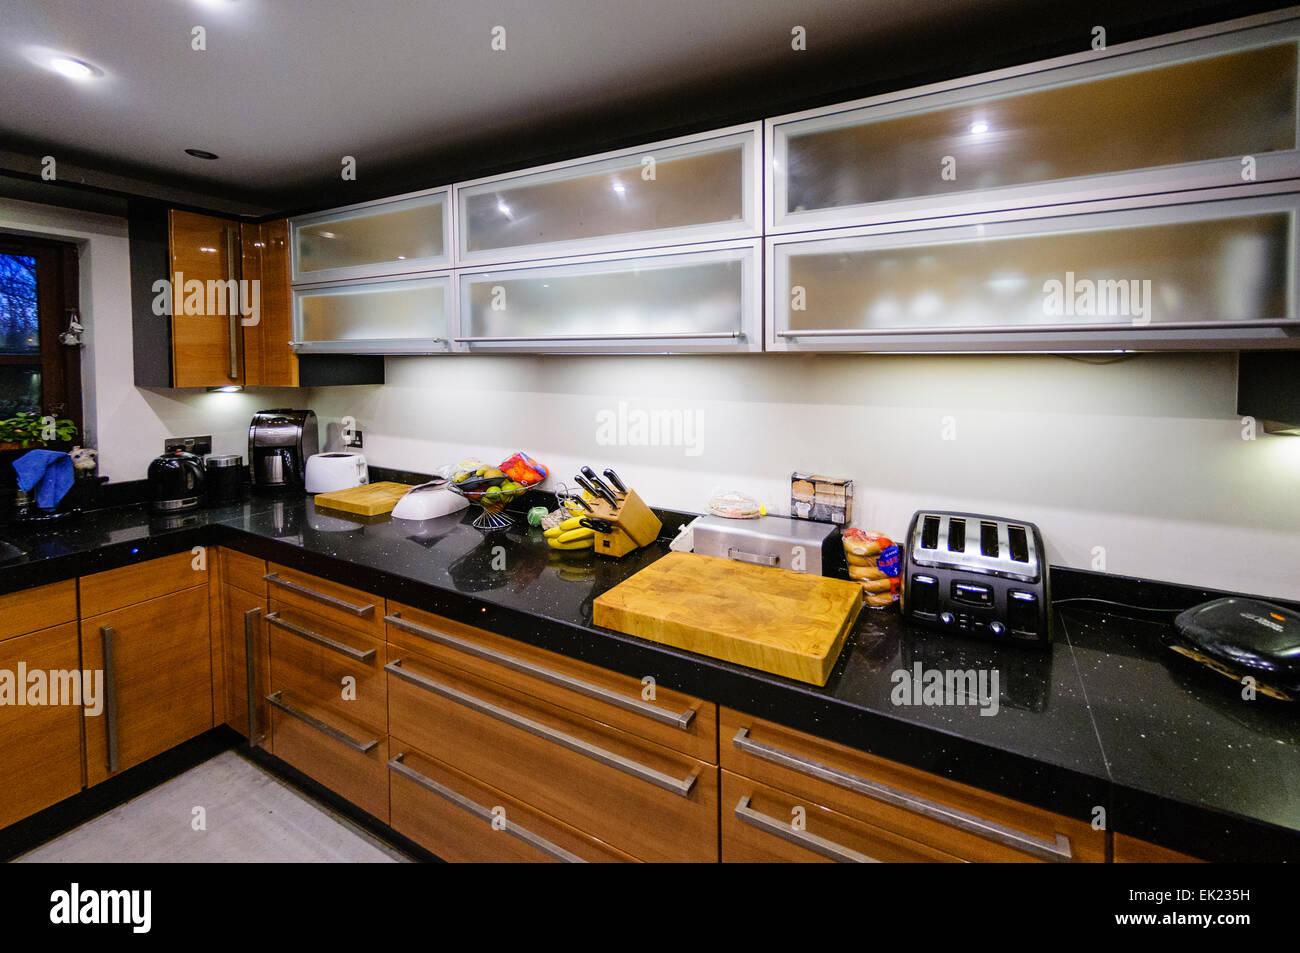 granite worktops stockfotos granite worktops bilder alamy. Black Bedroom Furniture Sets. Home Design Ideas